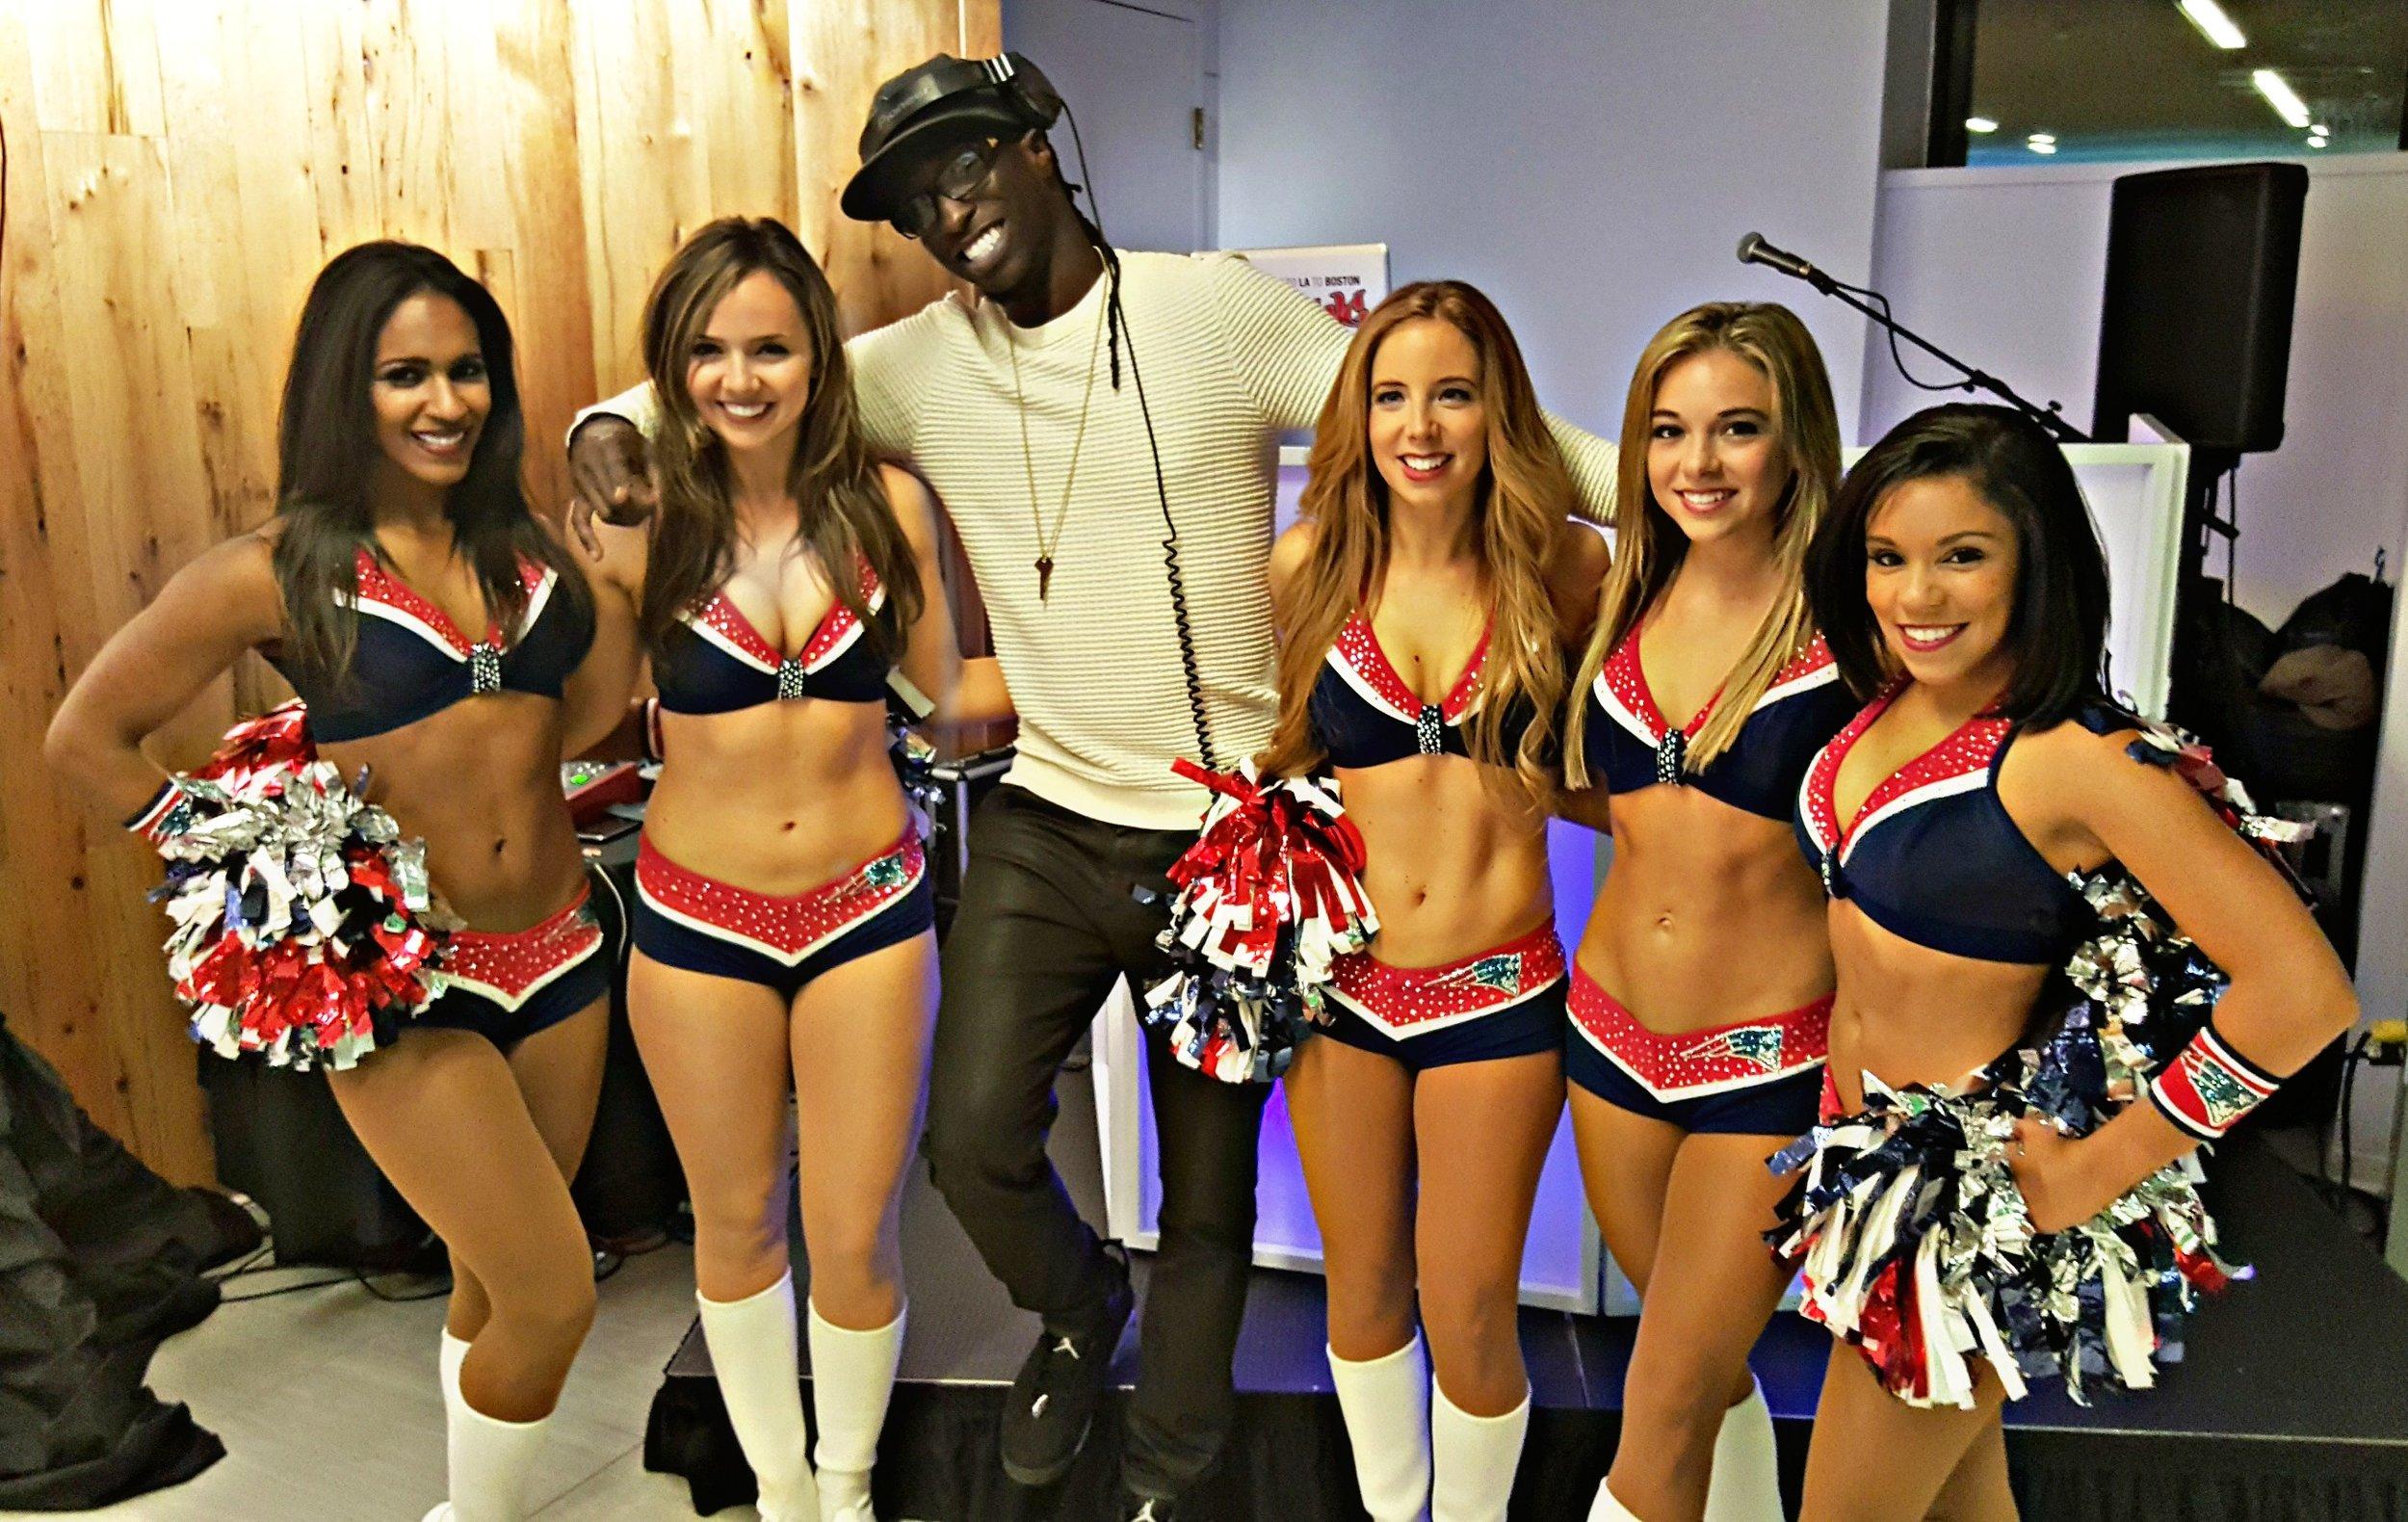 Smiling DCaso & Patriots Cheerleaders .jpg